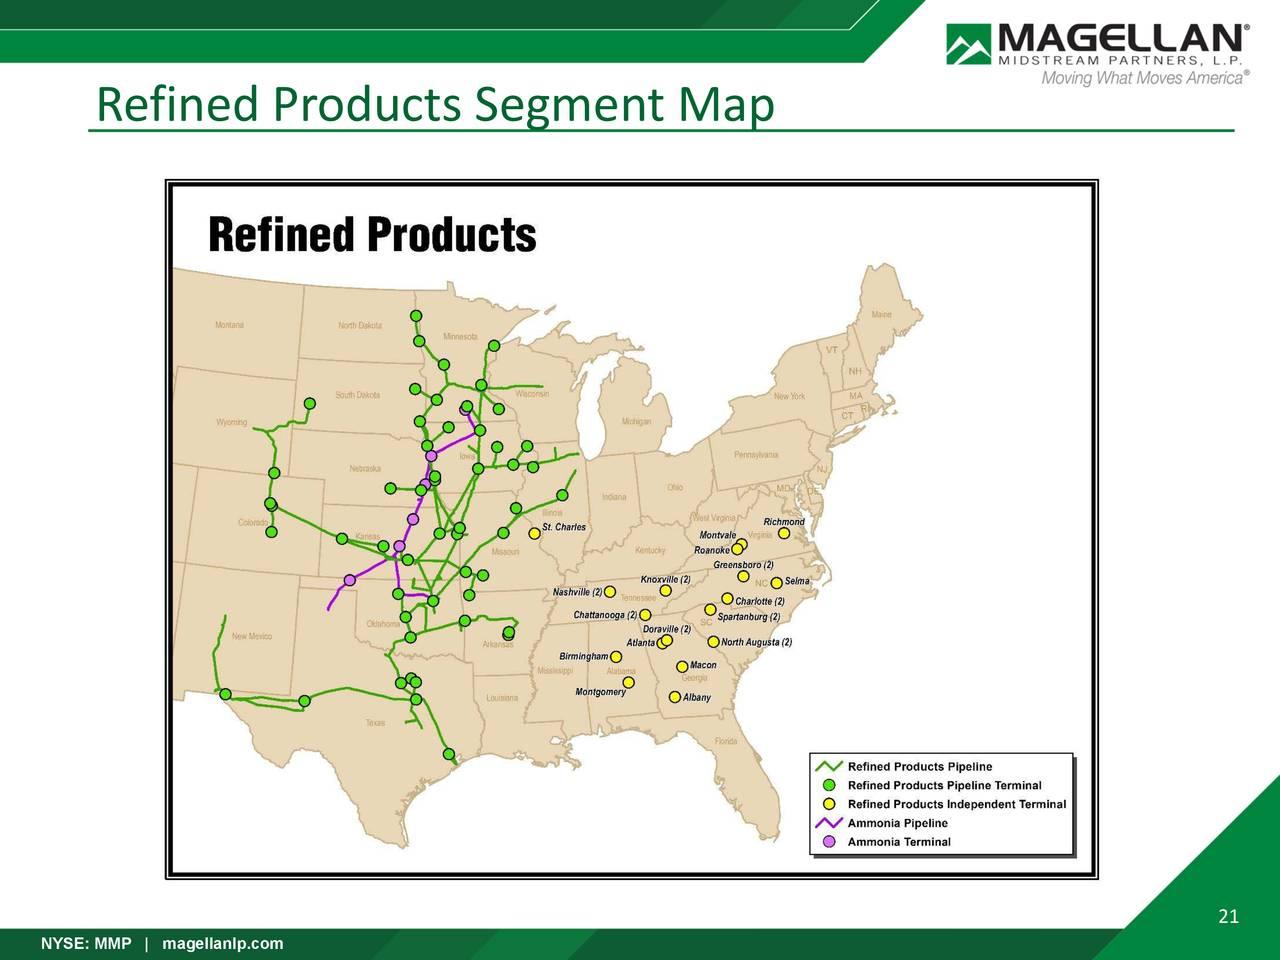 Magellan Midstream Partners (MMP) Investor Presentation